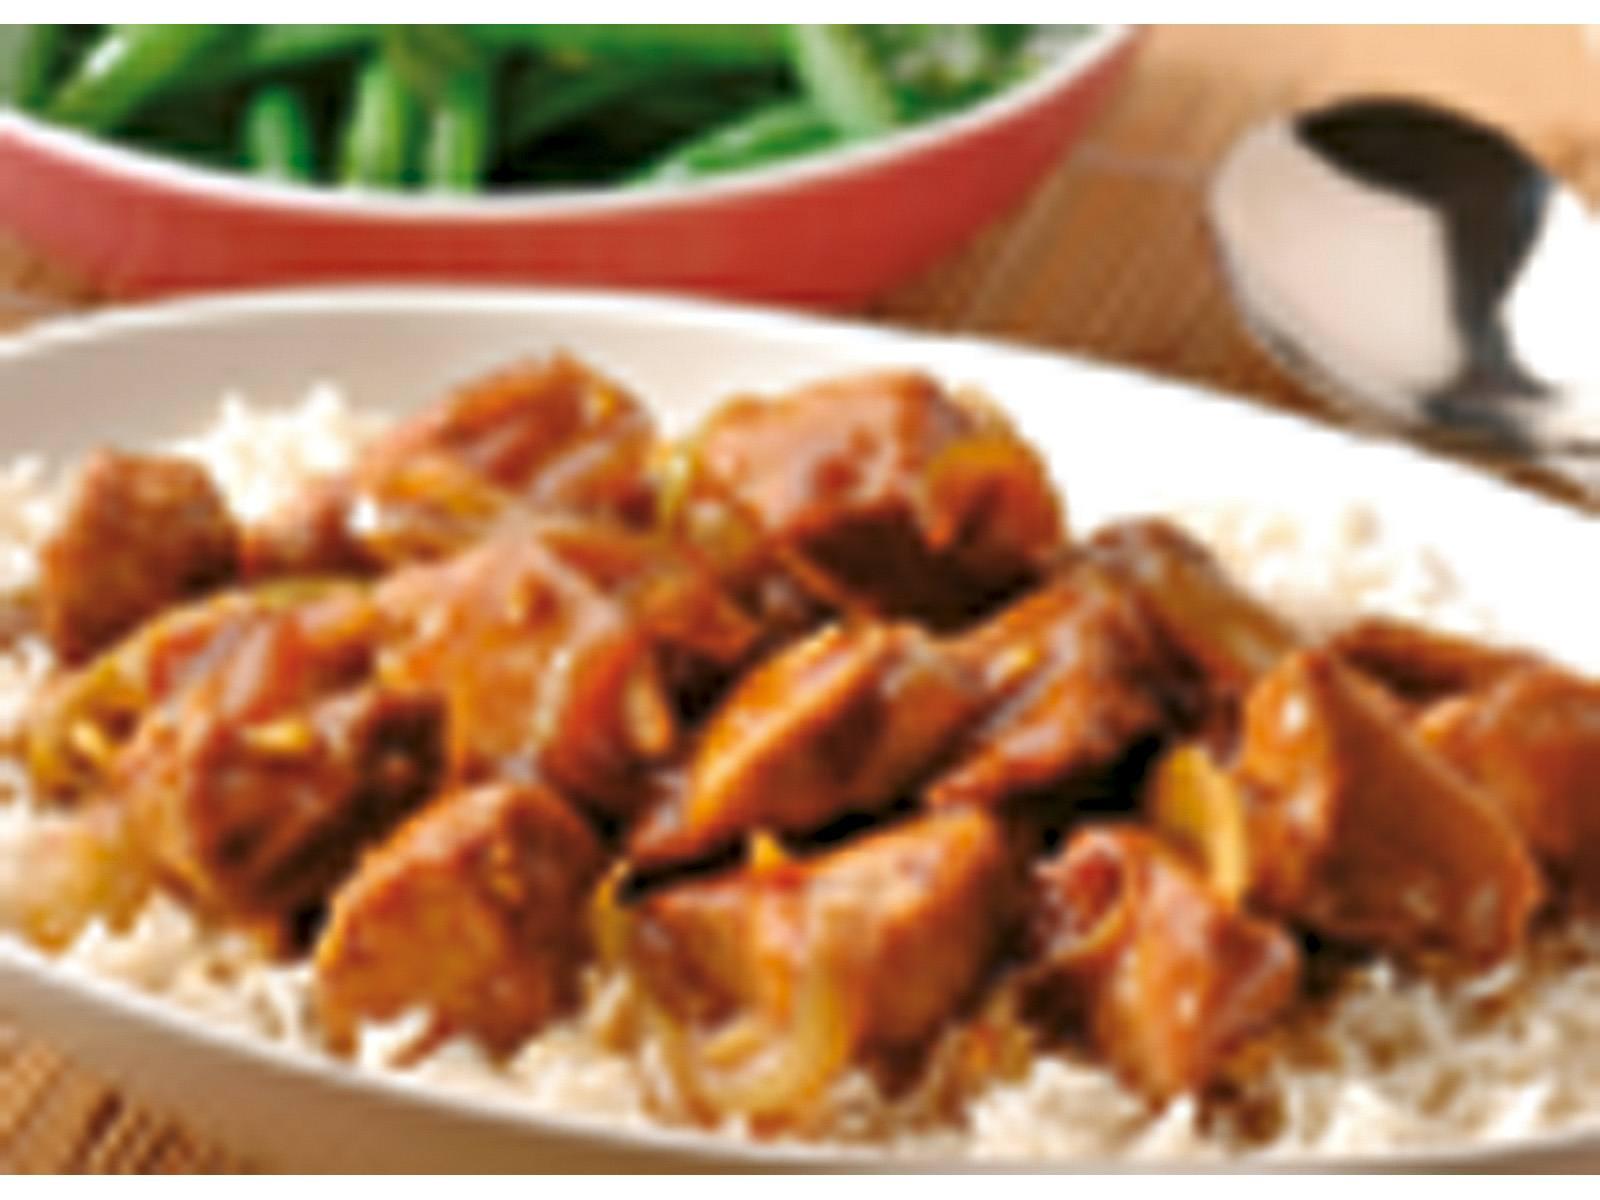 Babi ketjap Chinees Indisch varkensvlees met ketjapsaus